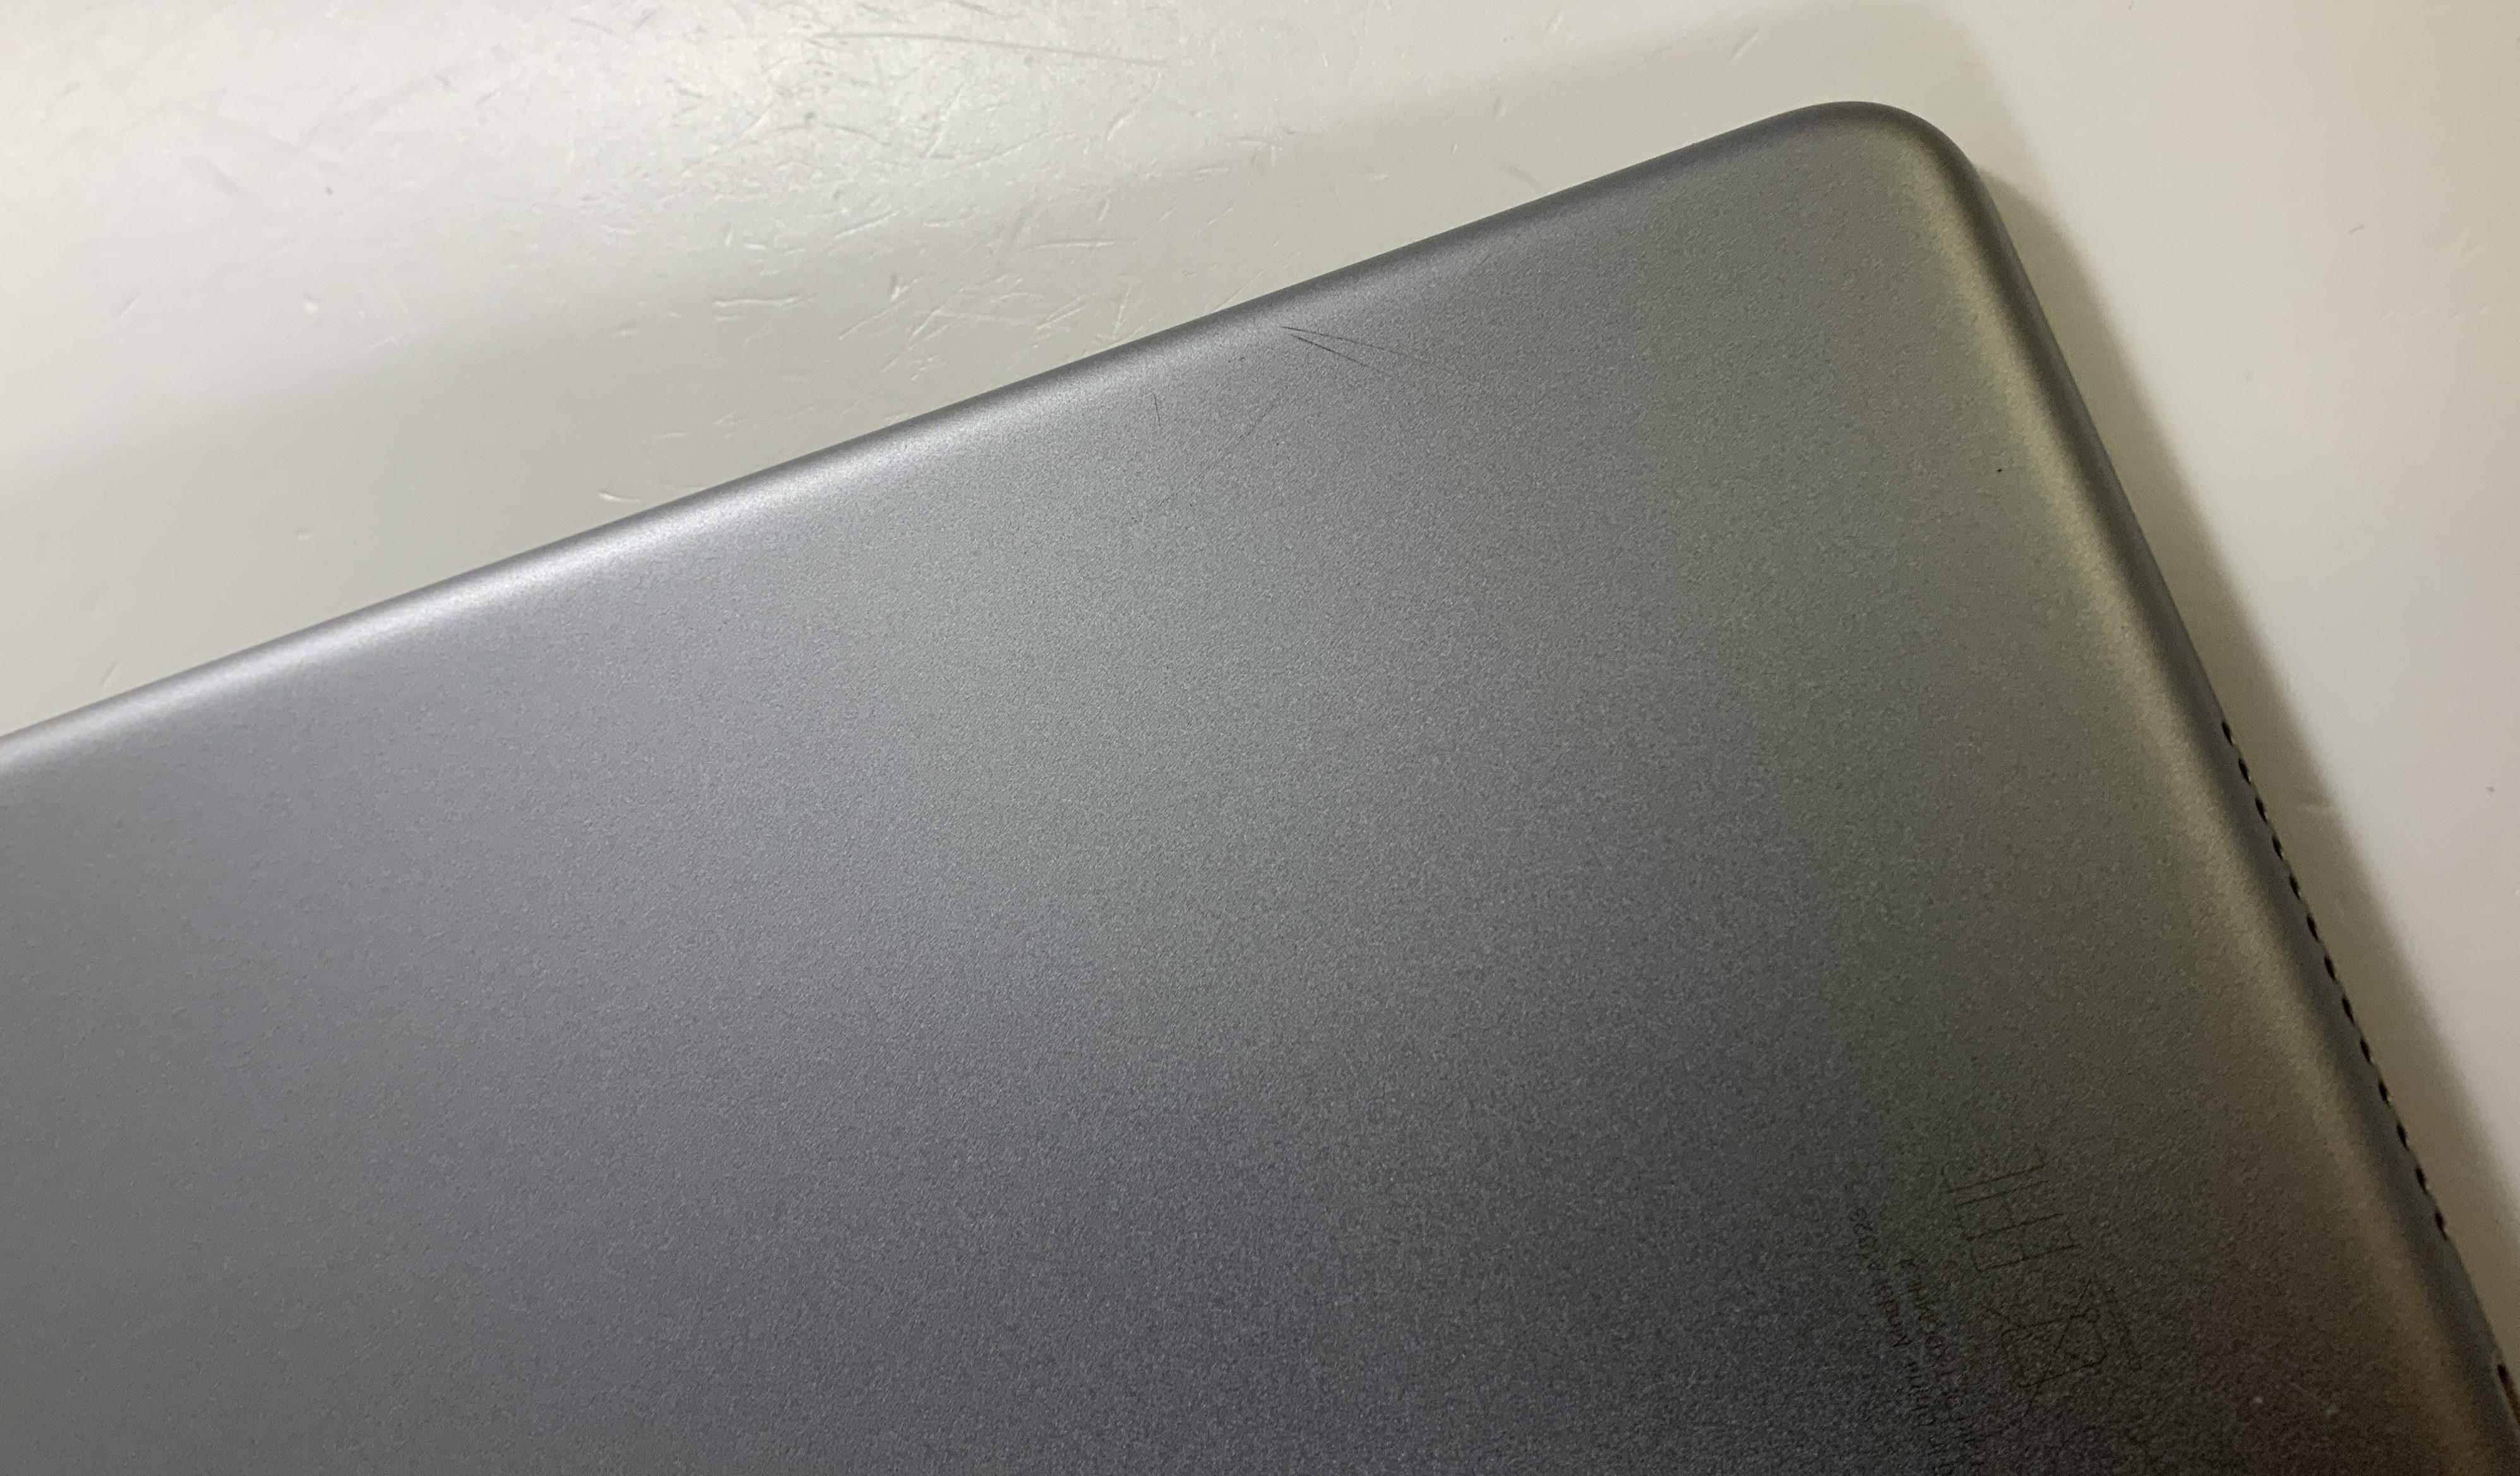 iPad 5 Wi-Fi + Cellular 128GB, 128GB, Space Gray, immagine 7